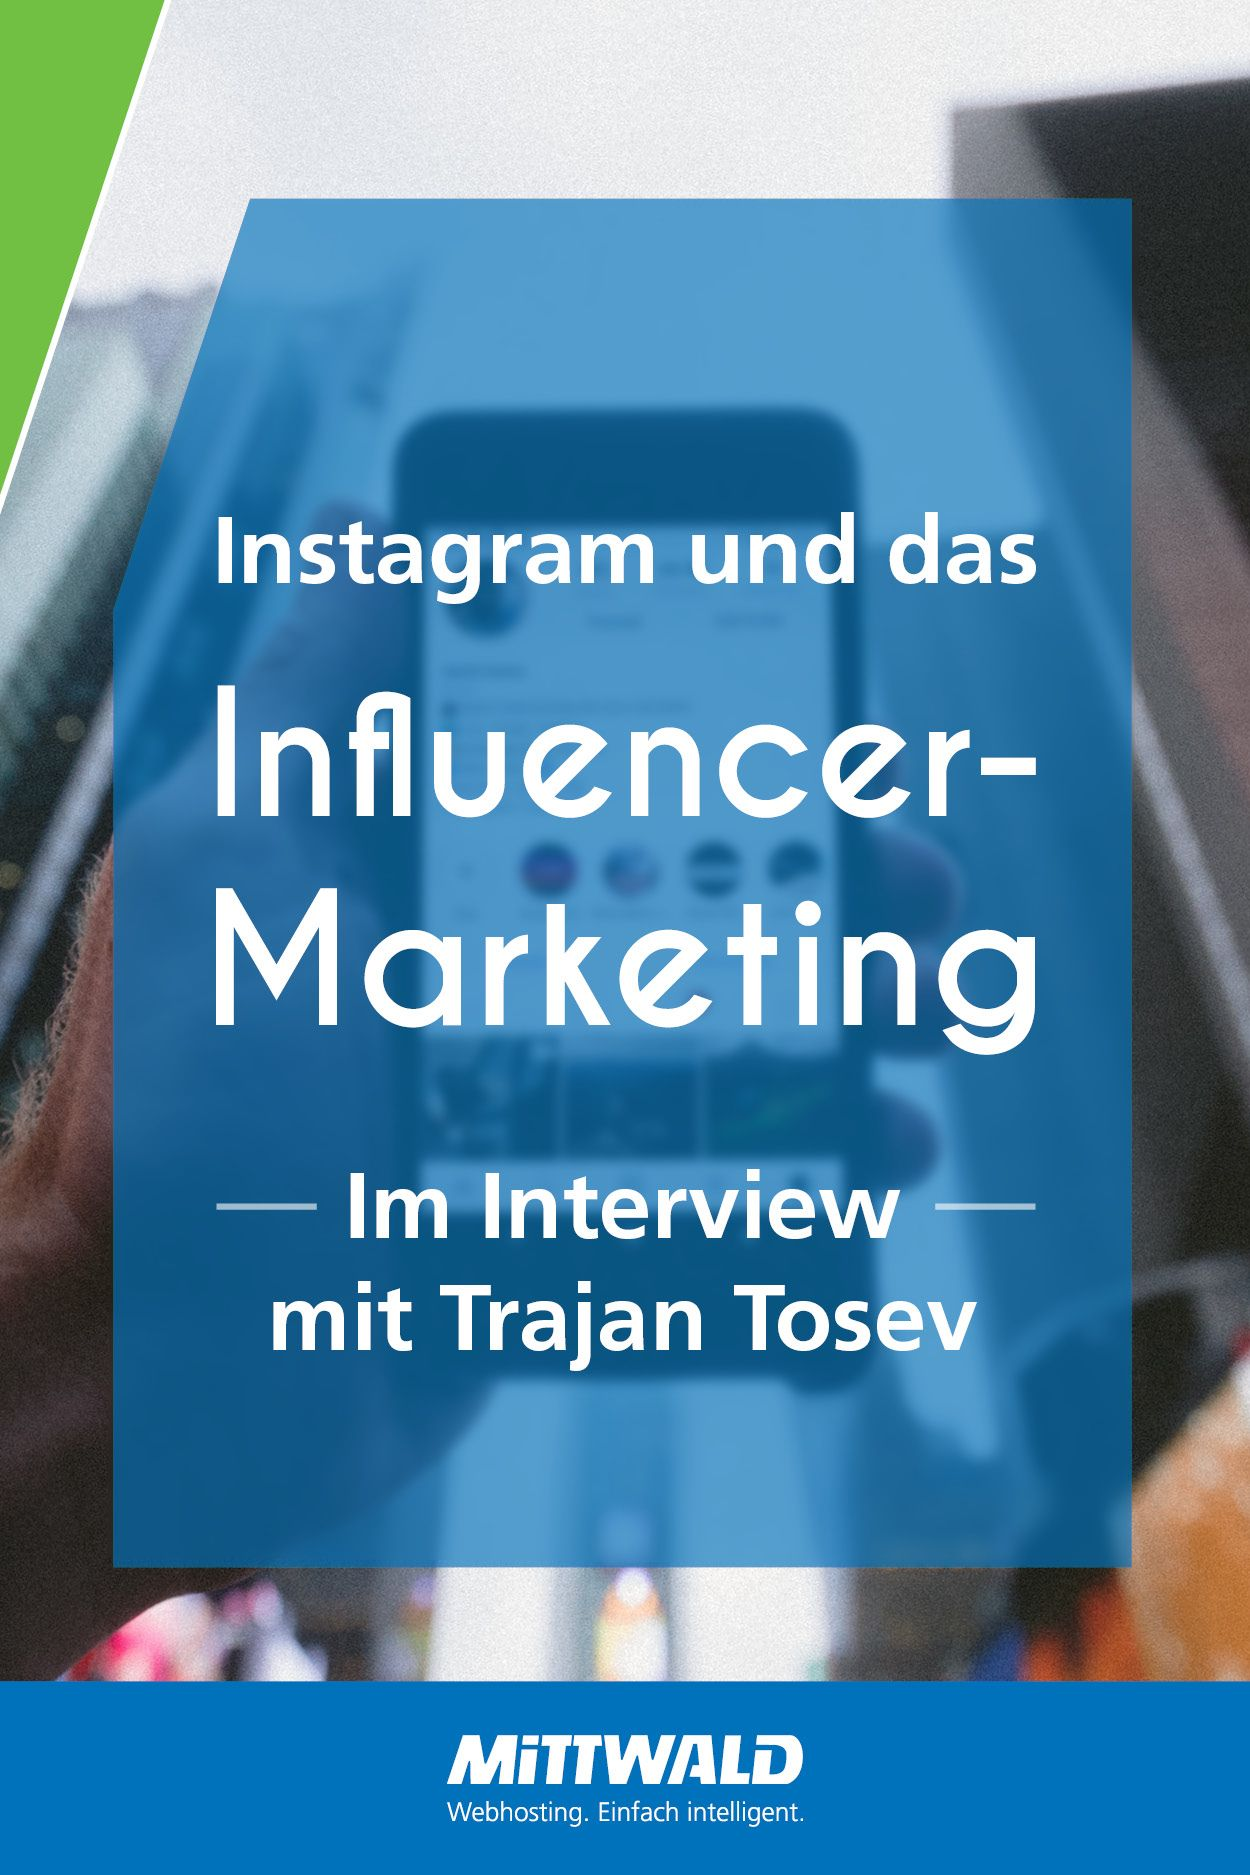 Online Marketing Berufe Karriere Bewerbung 7